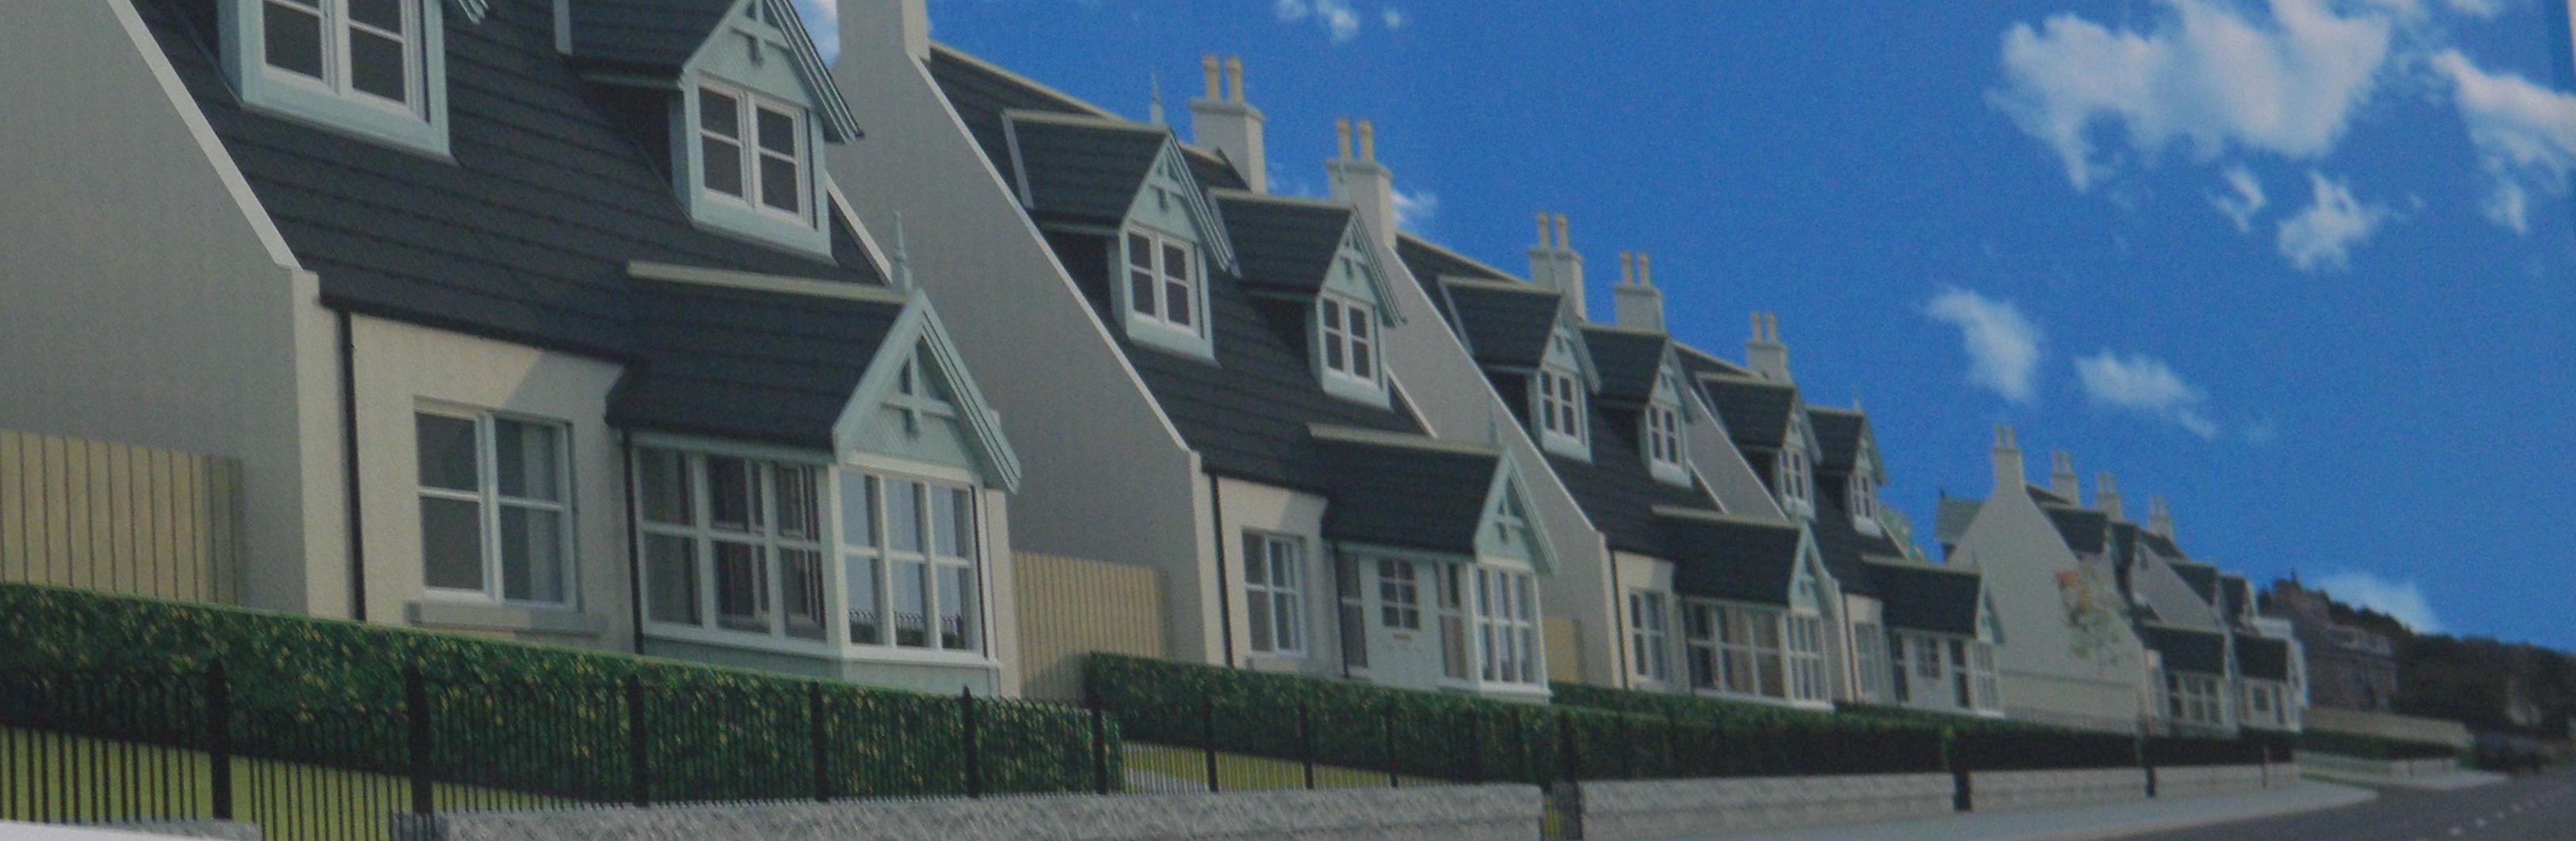 low cost housing options at cowdray fields echt iris walker. Black Bedroom Furniture Sets. Home Design Ideas